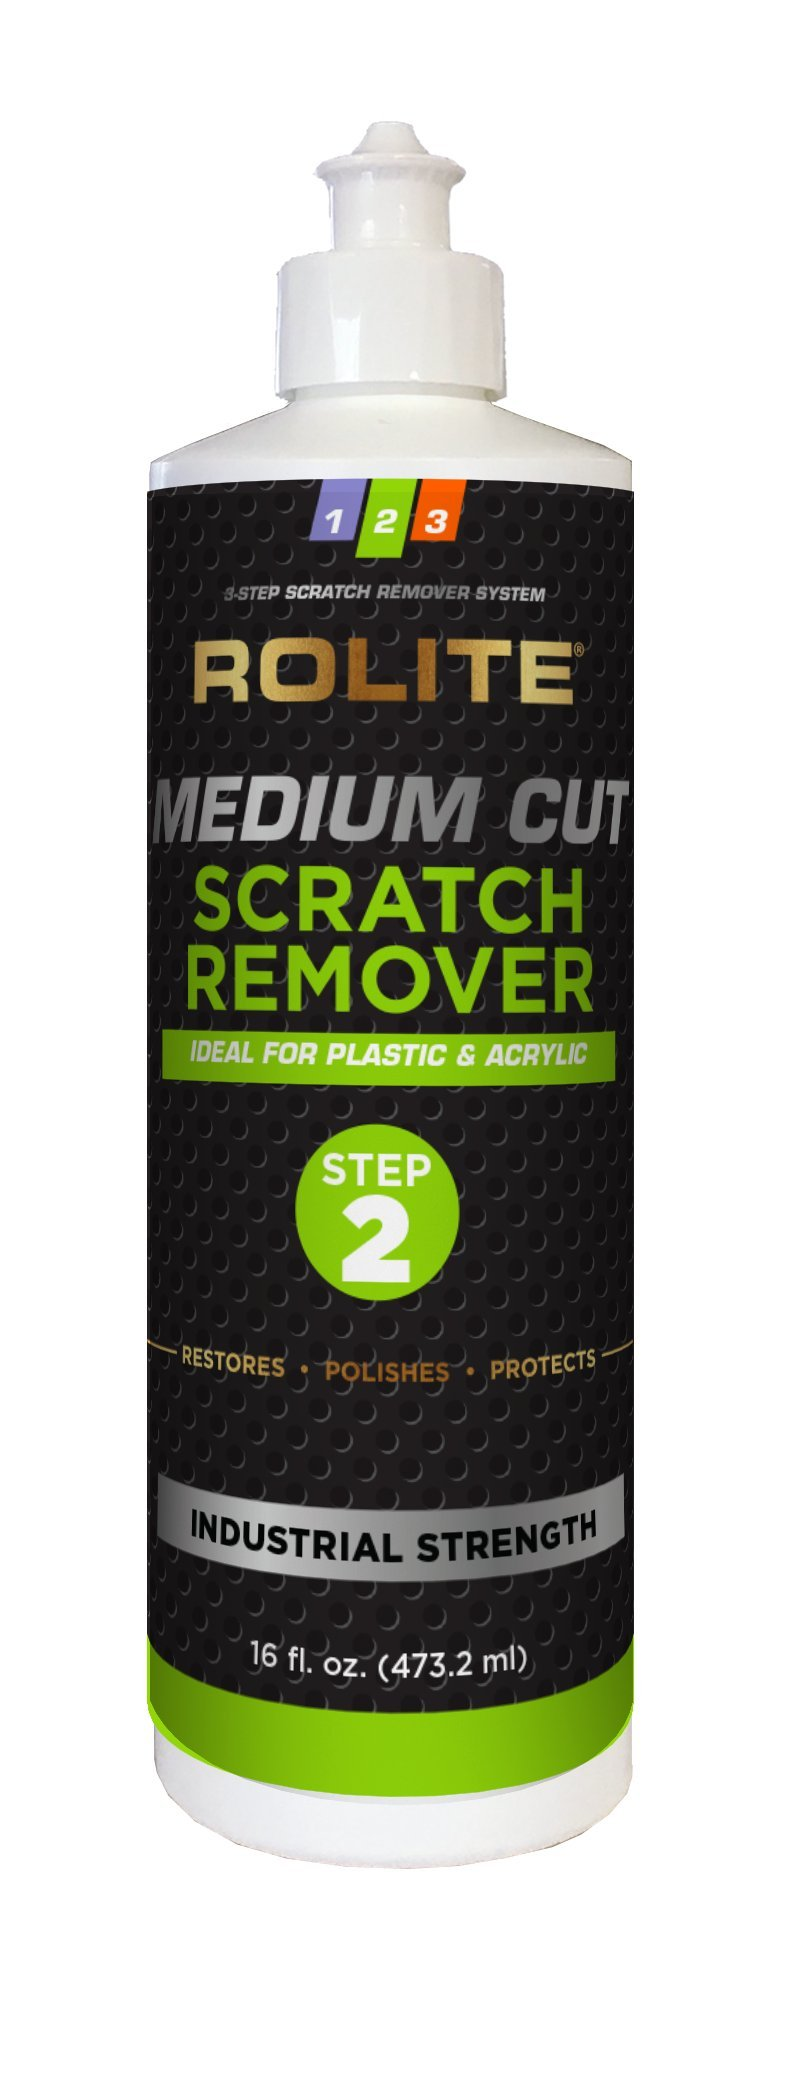 Rolite Medium Cut Scratch Remover (16 fl. oz.) for Plastic & Acrylic Surfaces Including Marine Strataglass & Eisenglass, Headlights, Aquariums